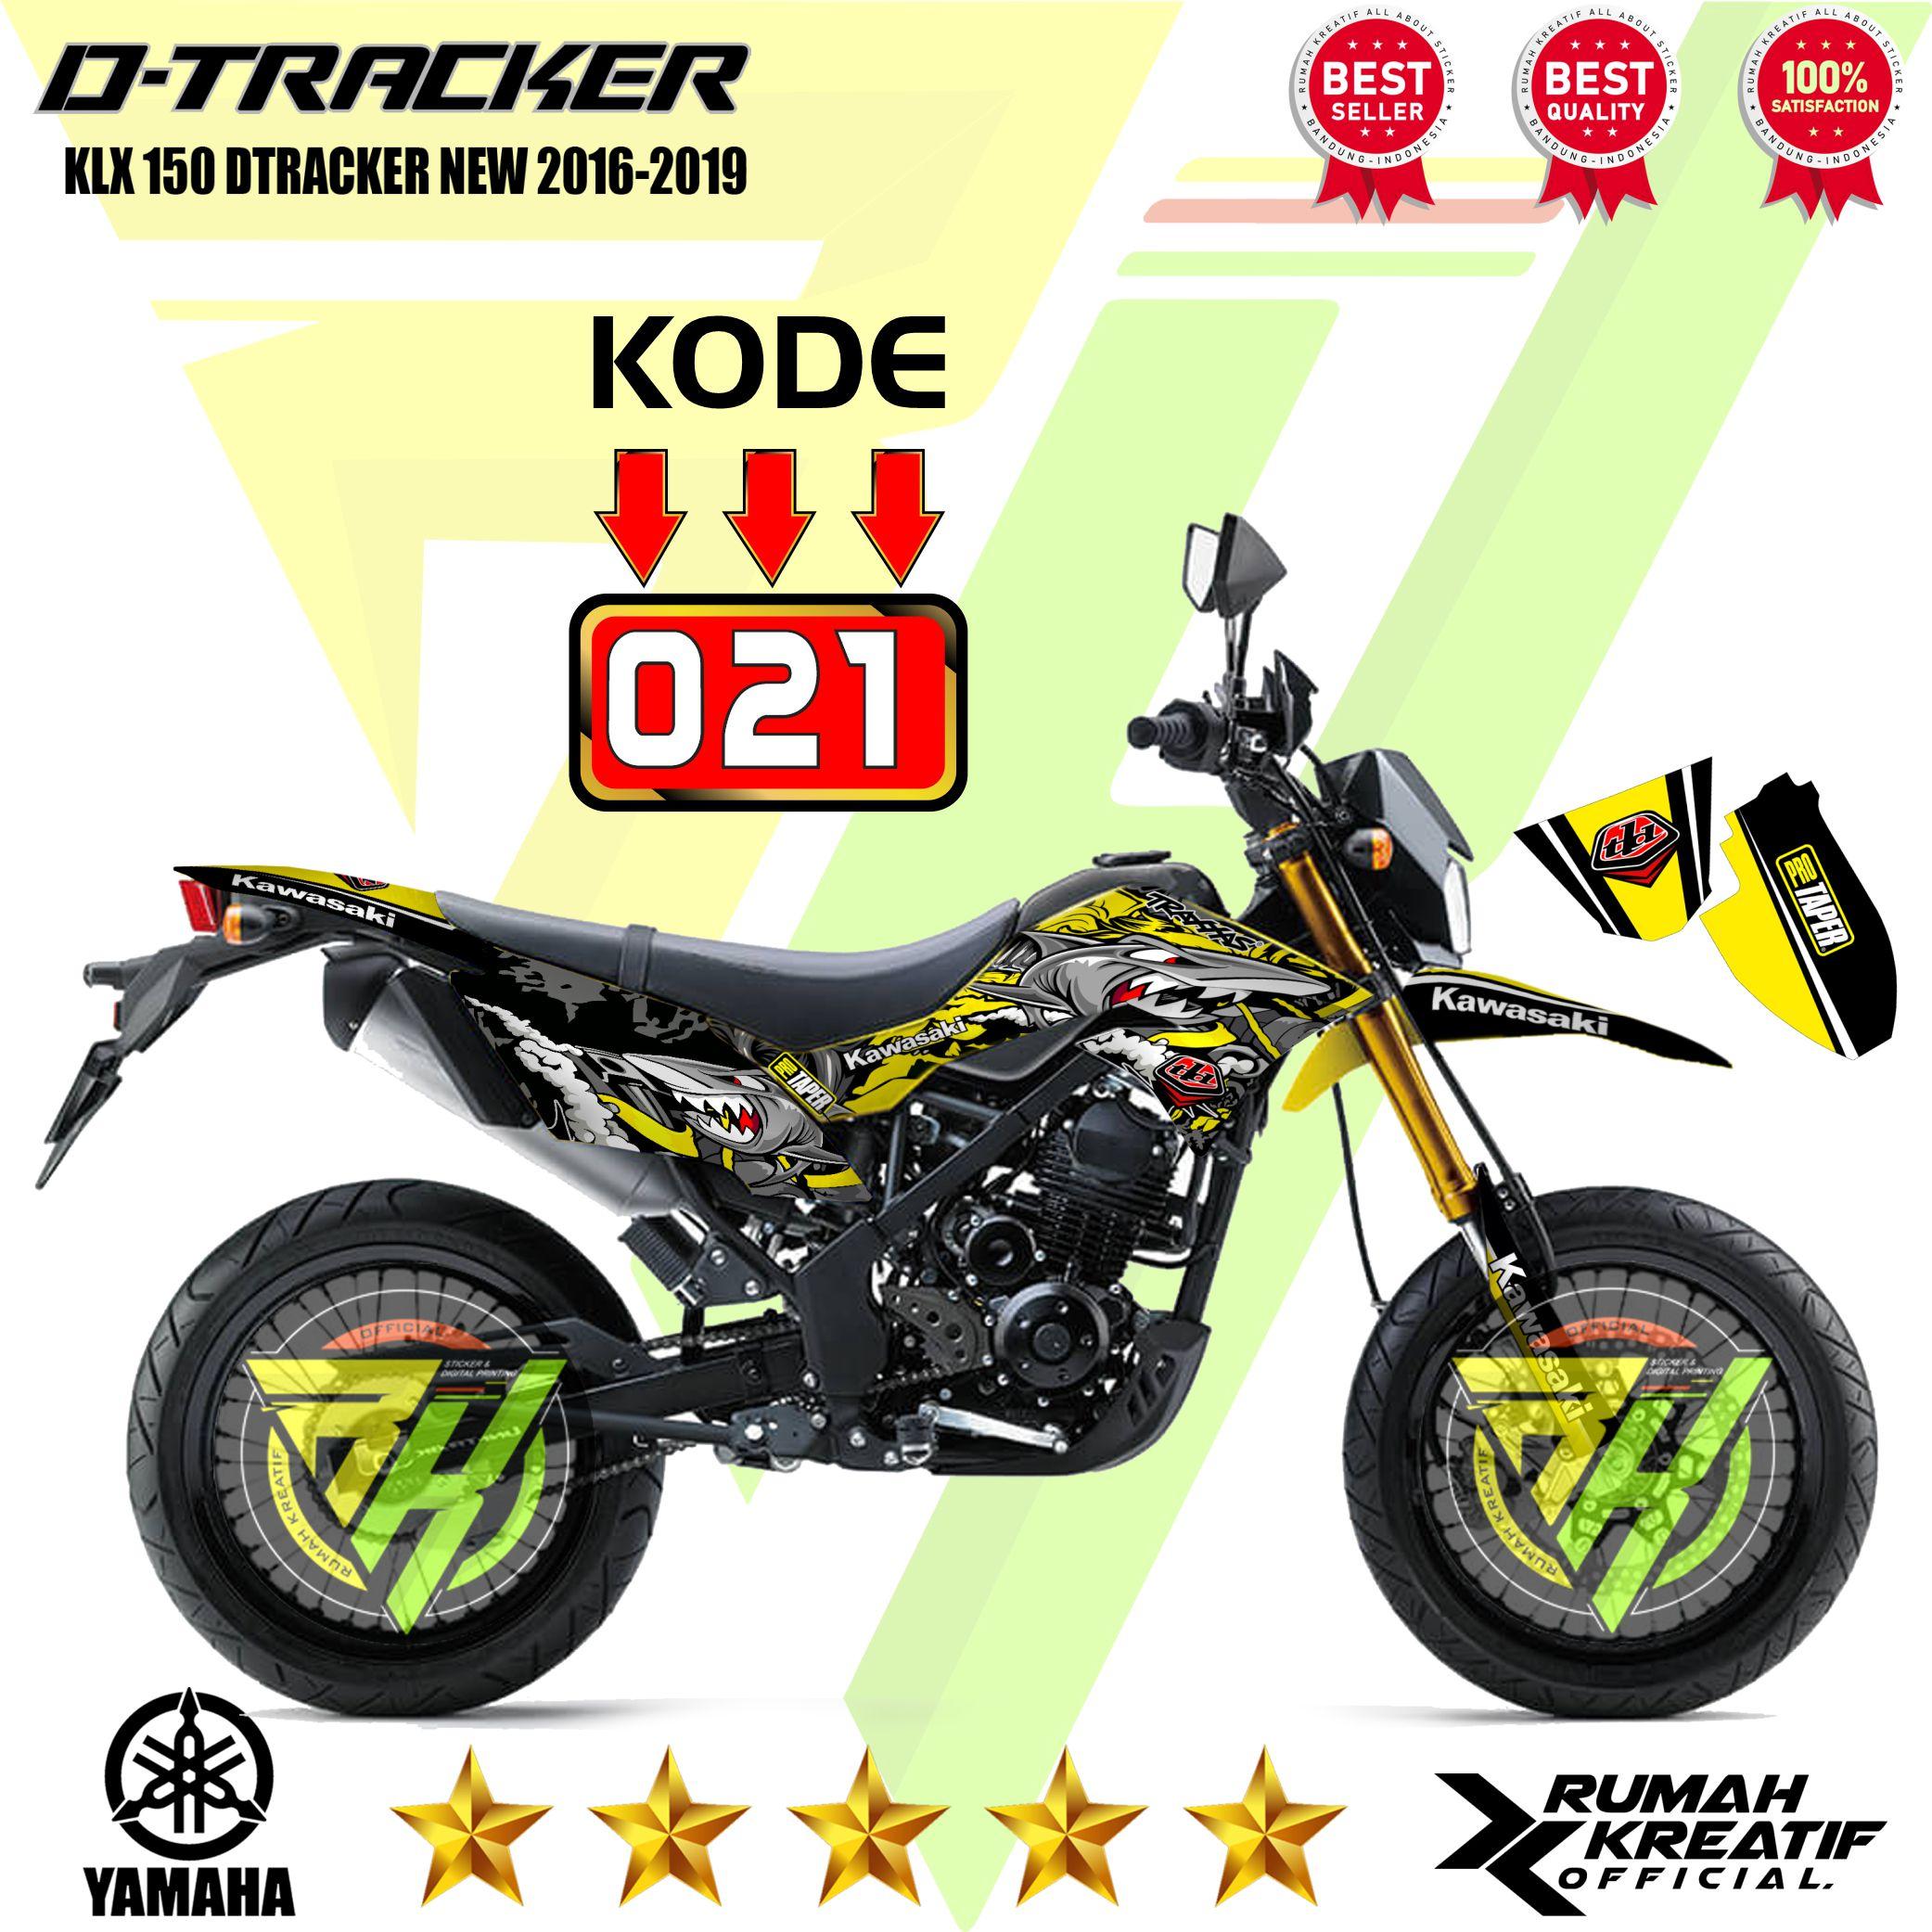 d-tracker (klx 150 dtracker new -) striping variasi